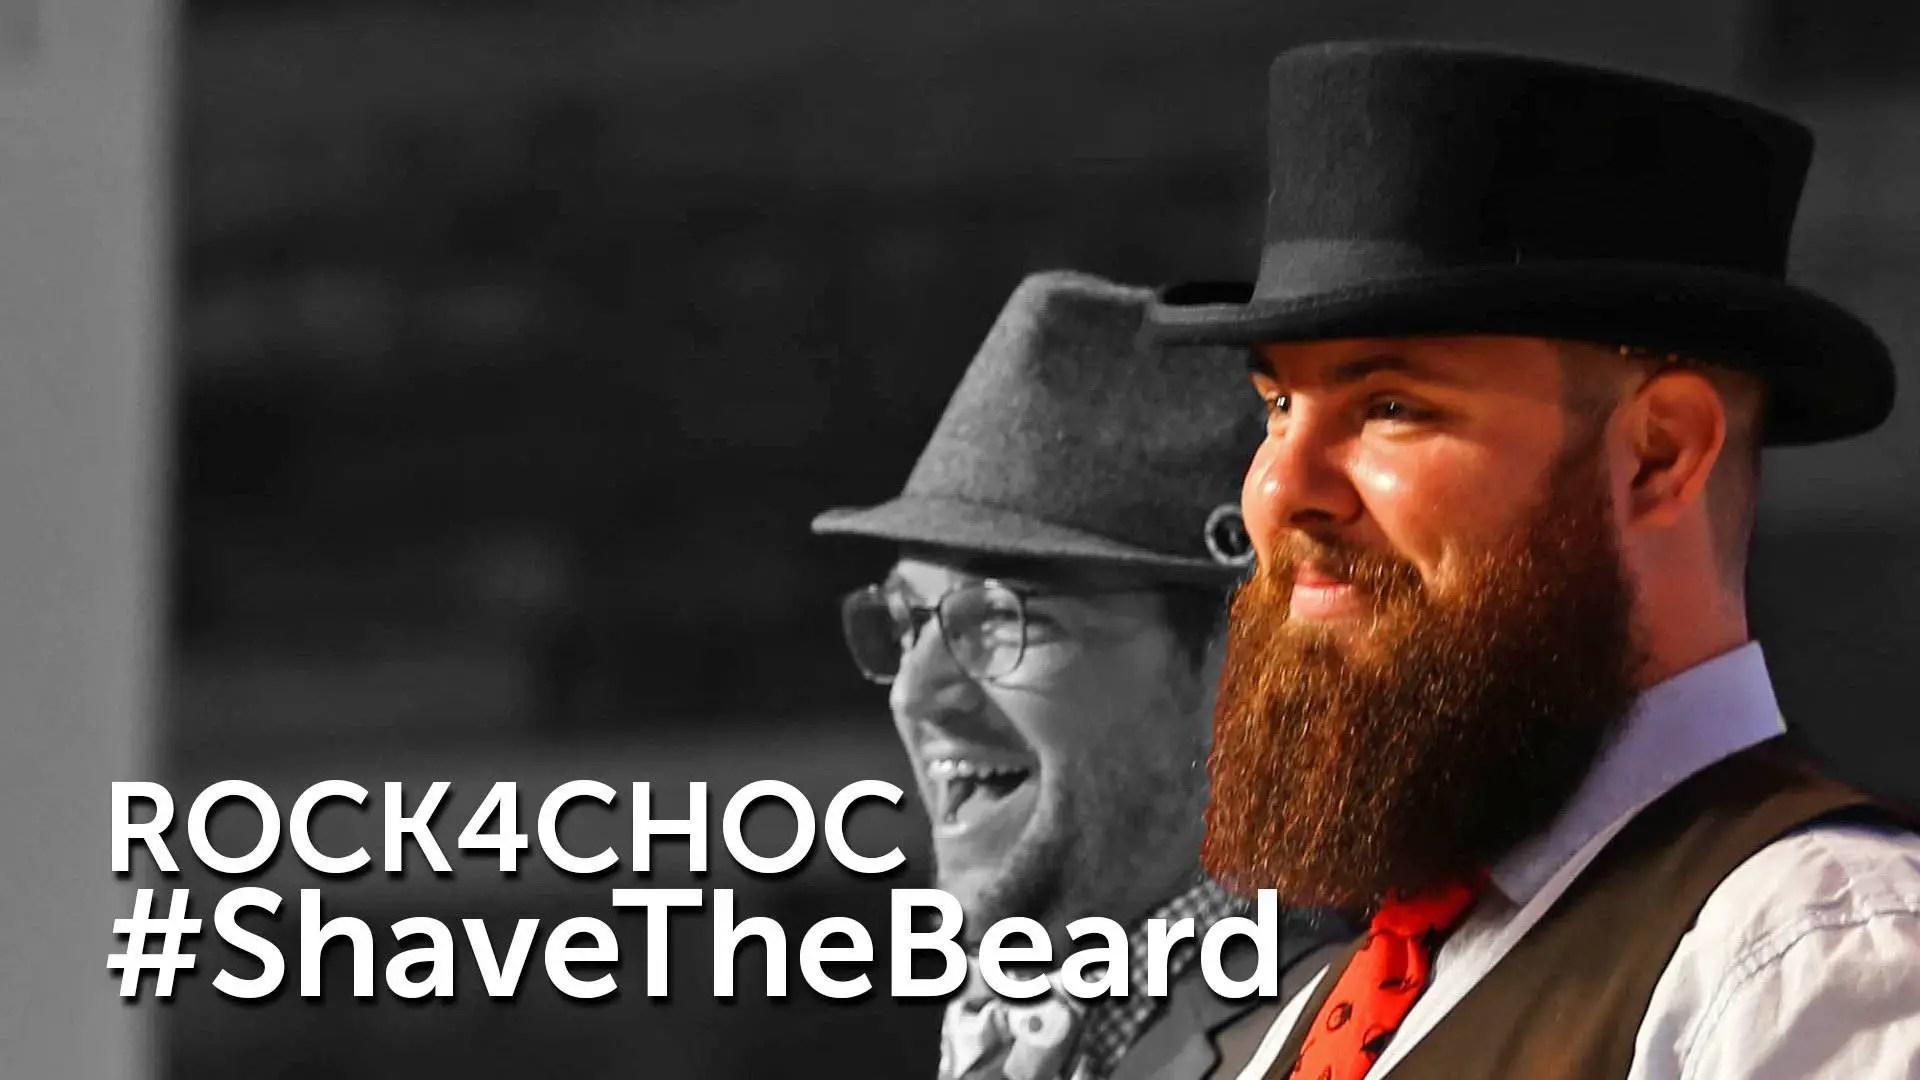 ROCK4CHOC - #ShaveTheBeard